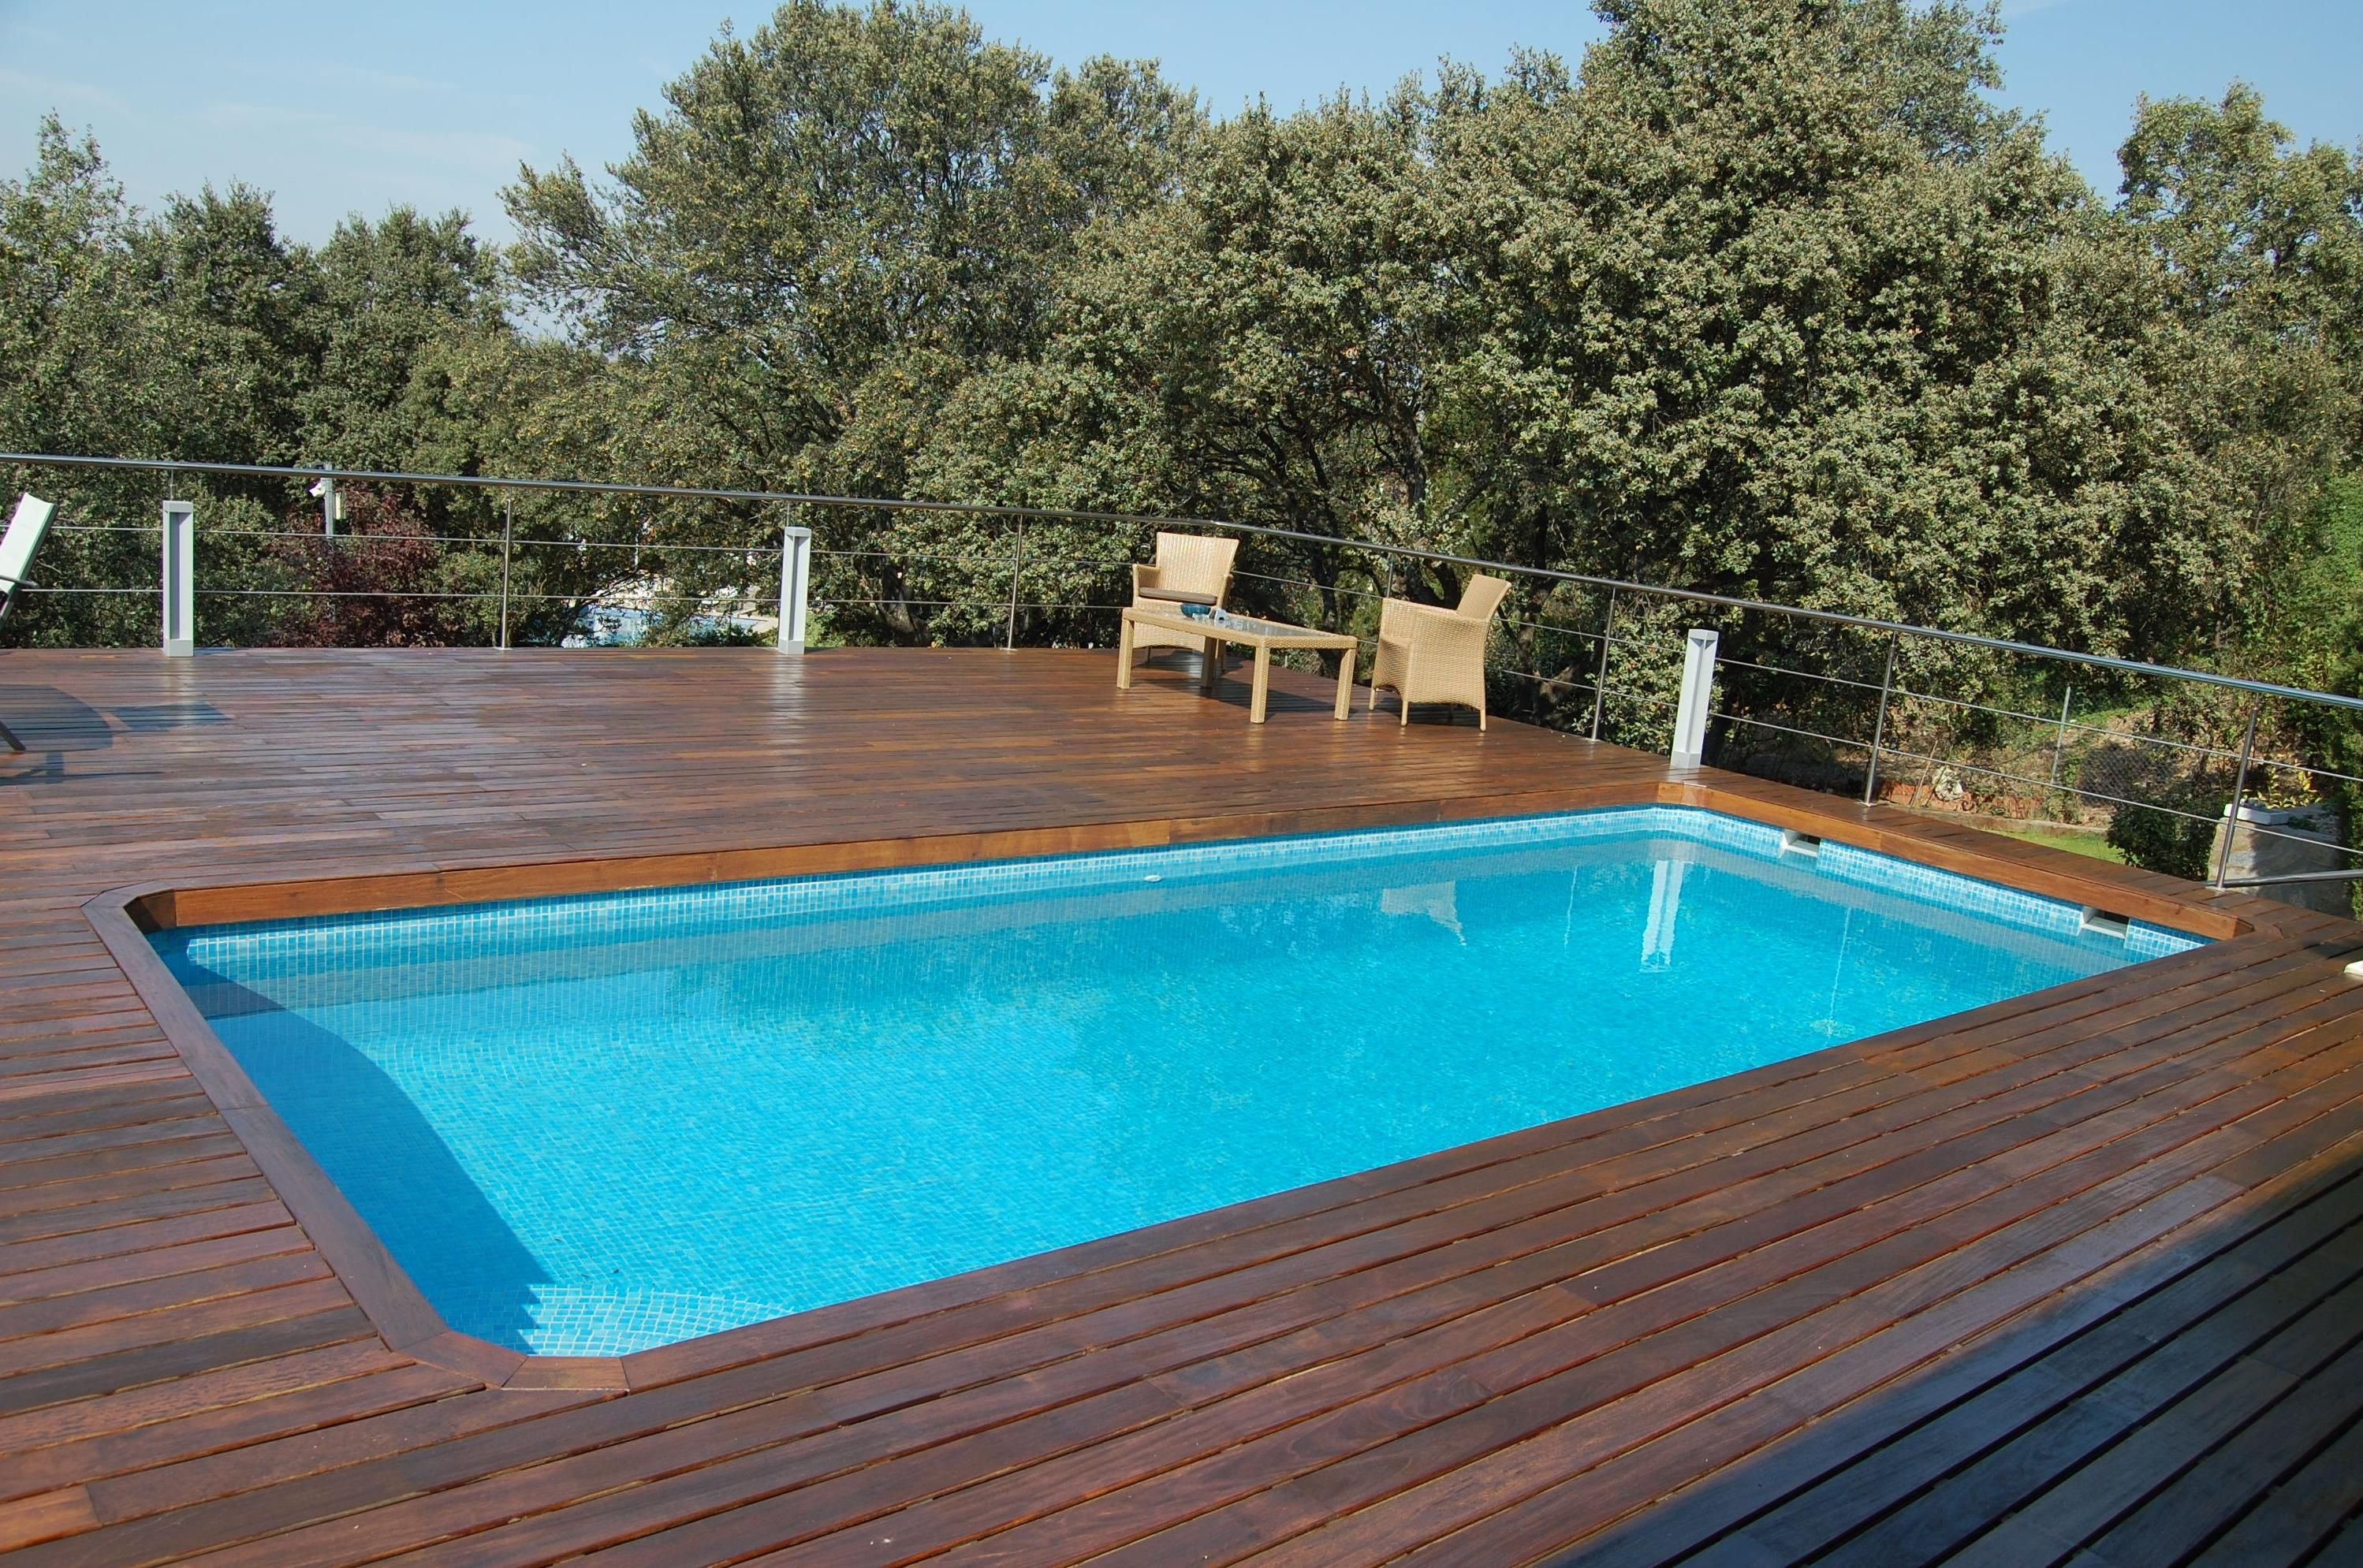 Piscinas elevadas de obra inicio escaleras para piscinas for Precio piscina pequena obra